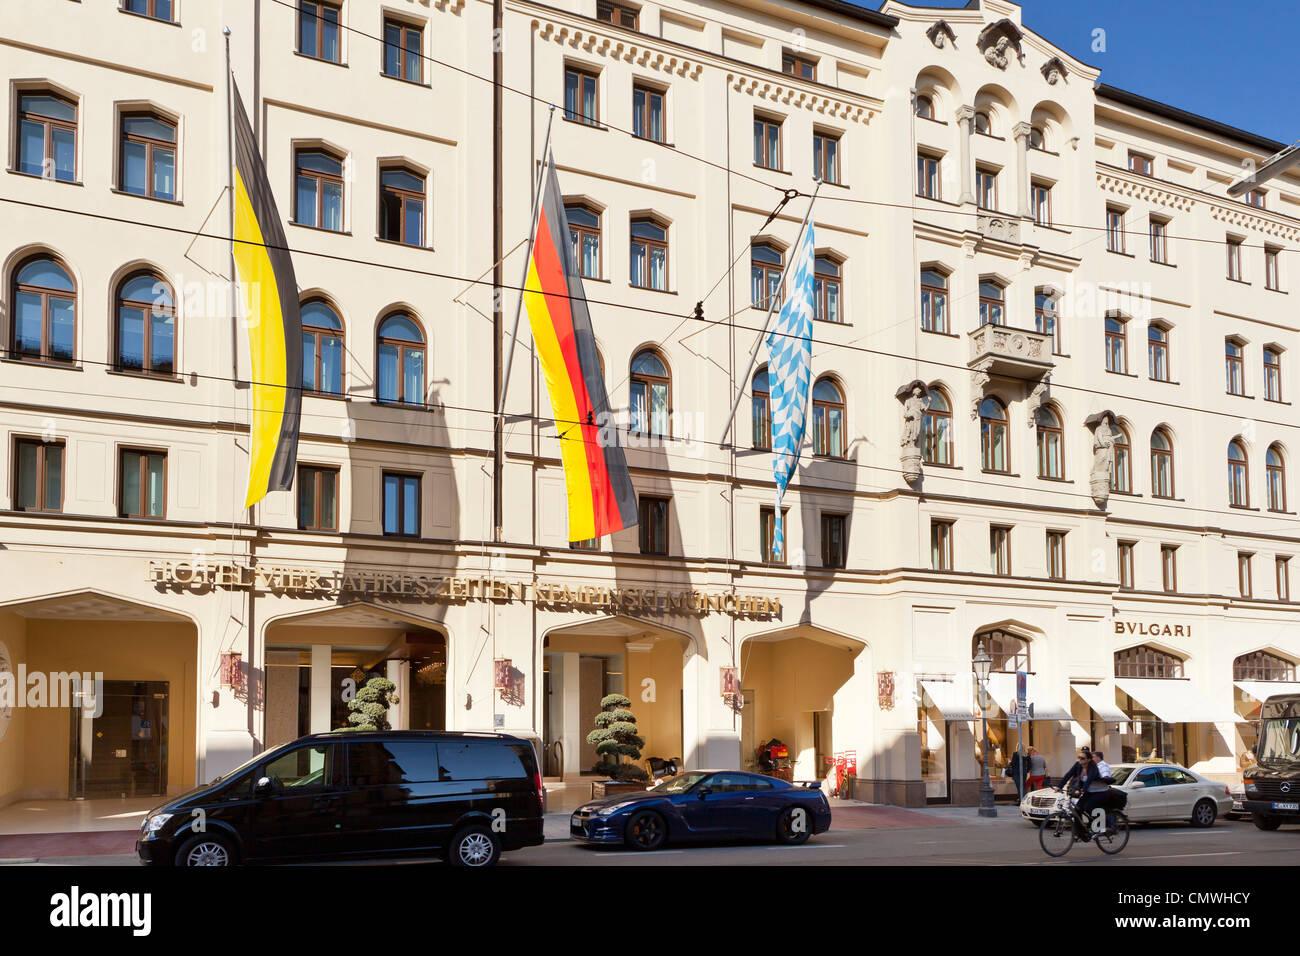 Hotel Four Seasons (Vier Jahreszeiten)/ Kempinski in the Maximiliansstreet, Munich, Bavaria, Germany, Europe Stock Photo